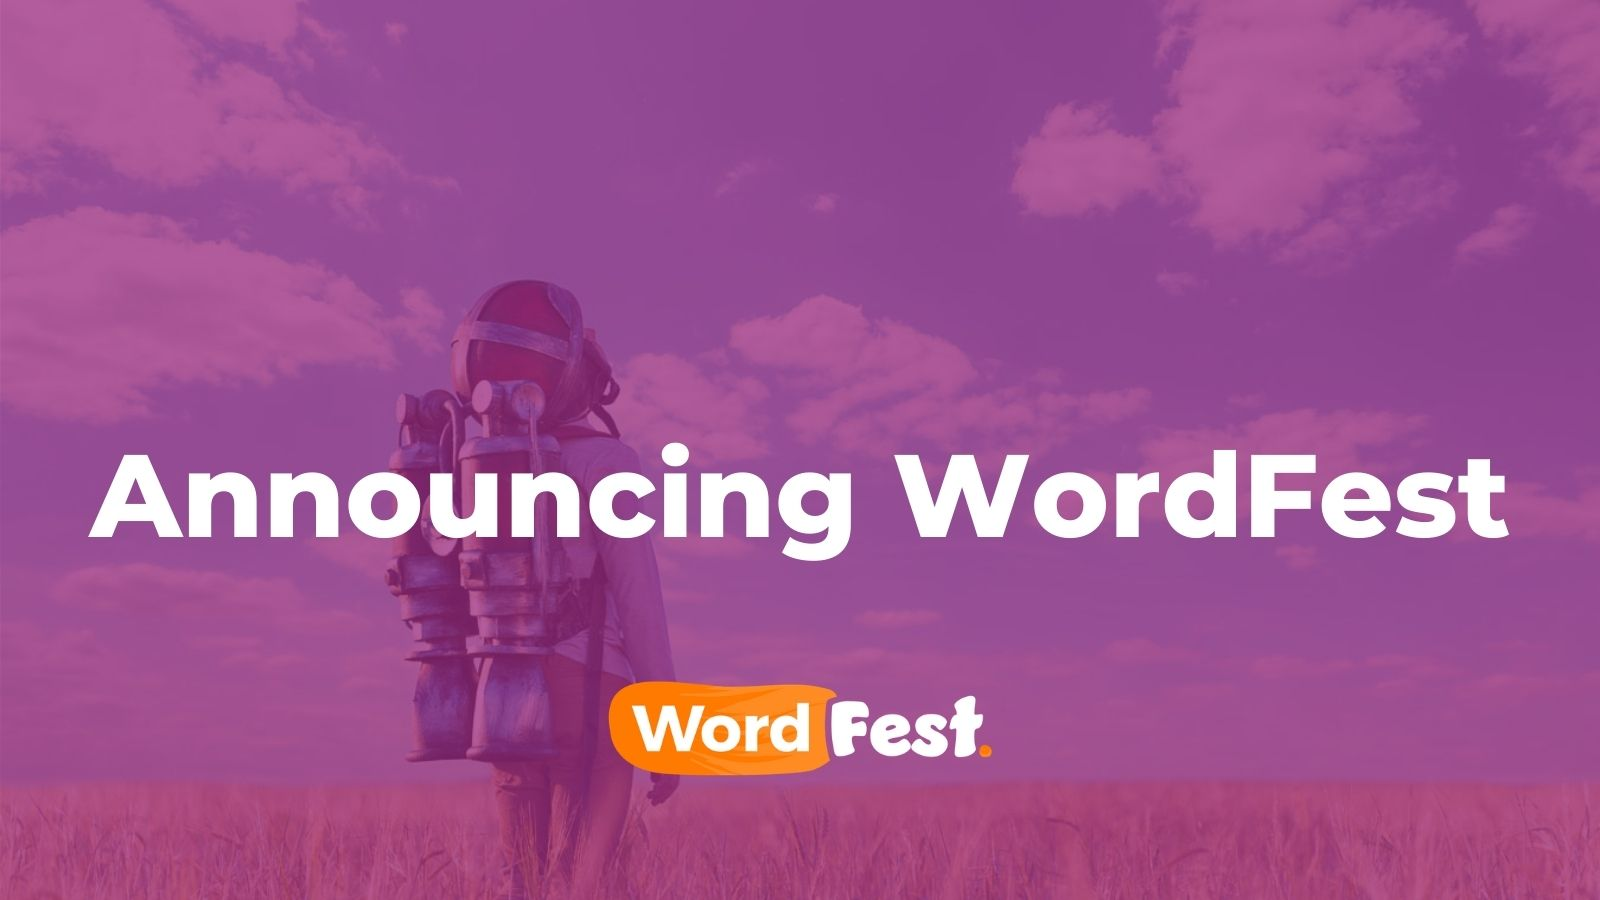 Announcing WordFest - A 24-Hour Celebration of WordPress